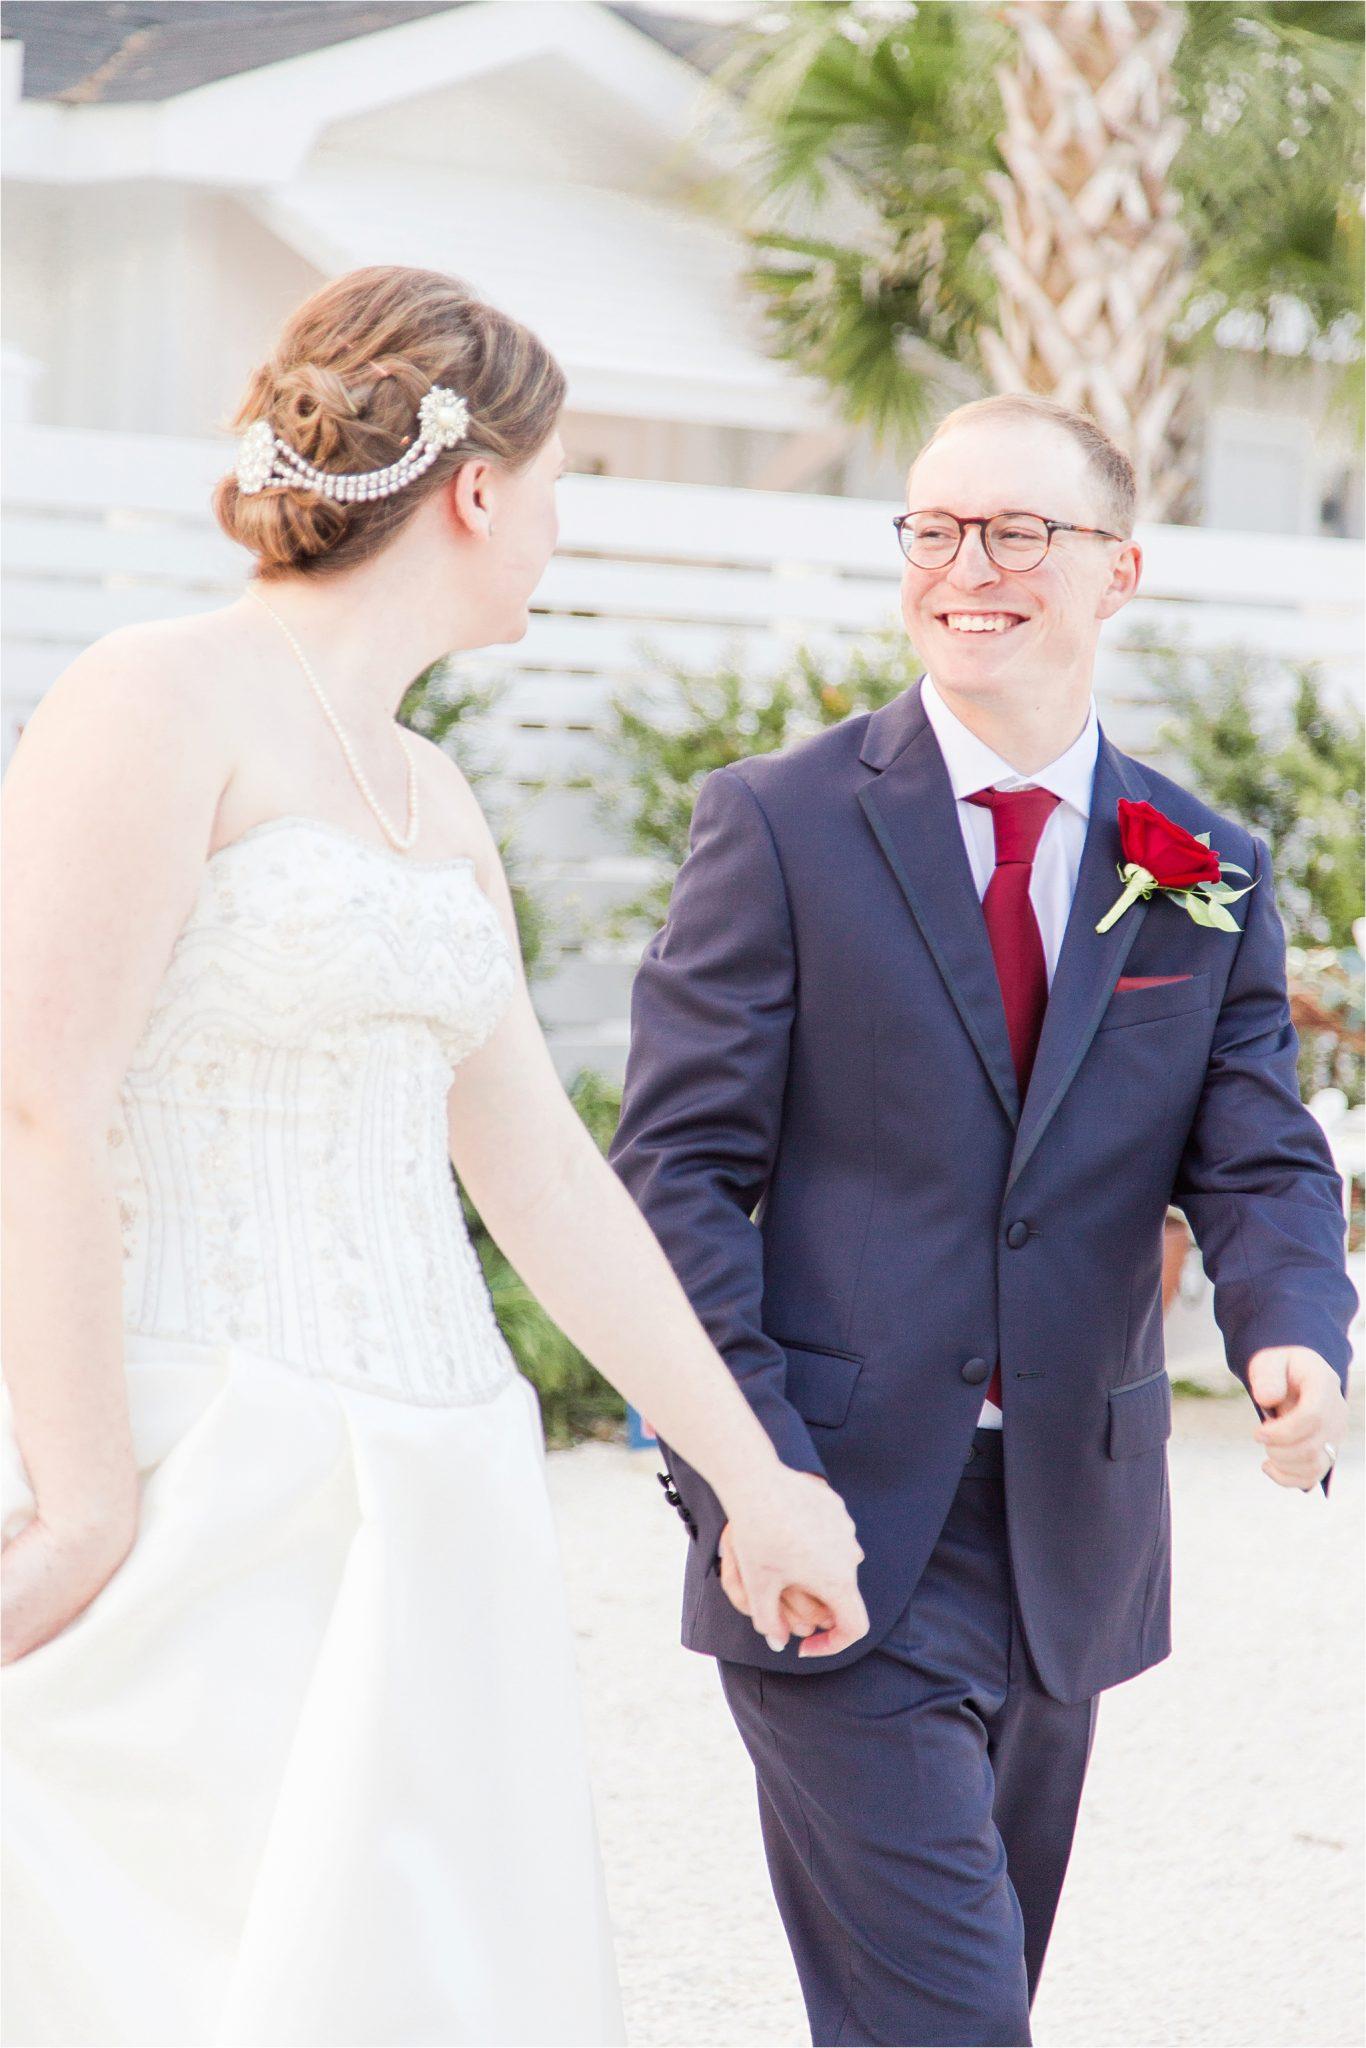 Alabama Wedding Photographer-Little Point Clear Winter Wedding-Meri Beth + Andrew-Bride and Groom-Groom boutonnière-Rose boutonnière